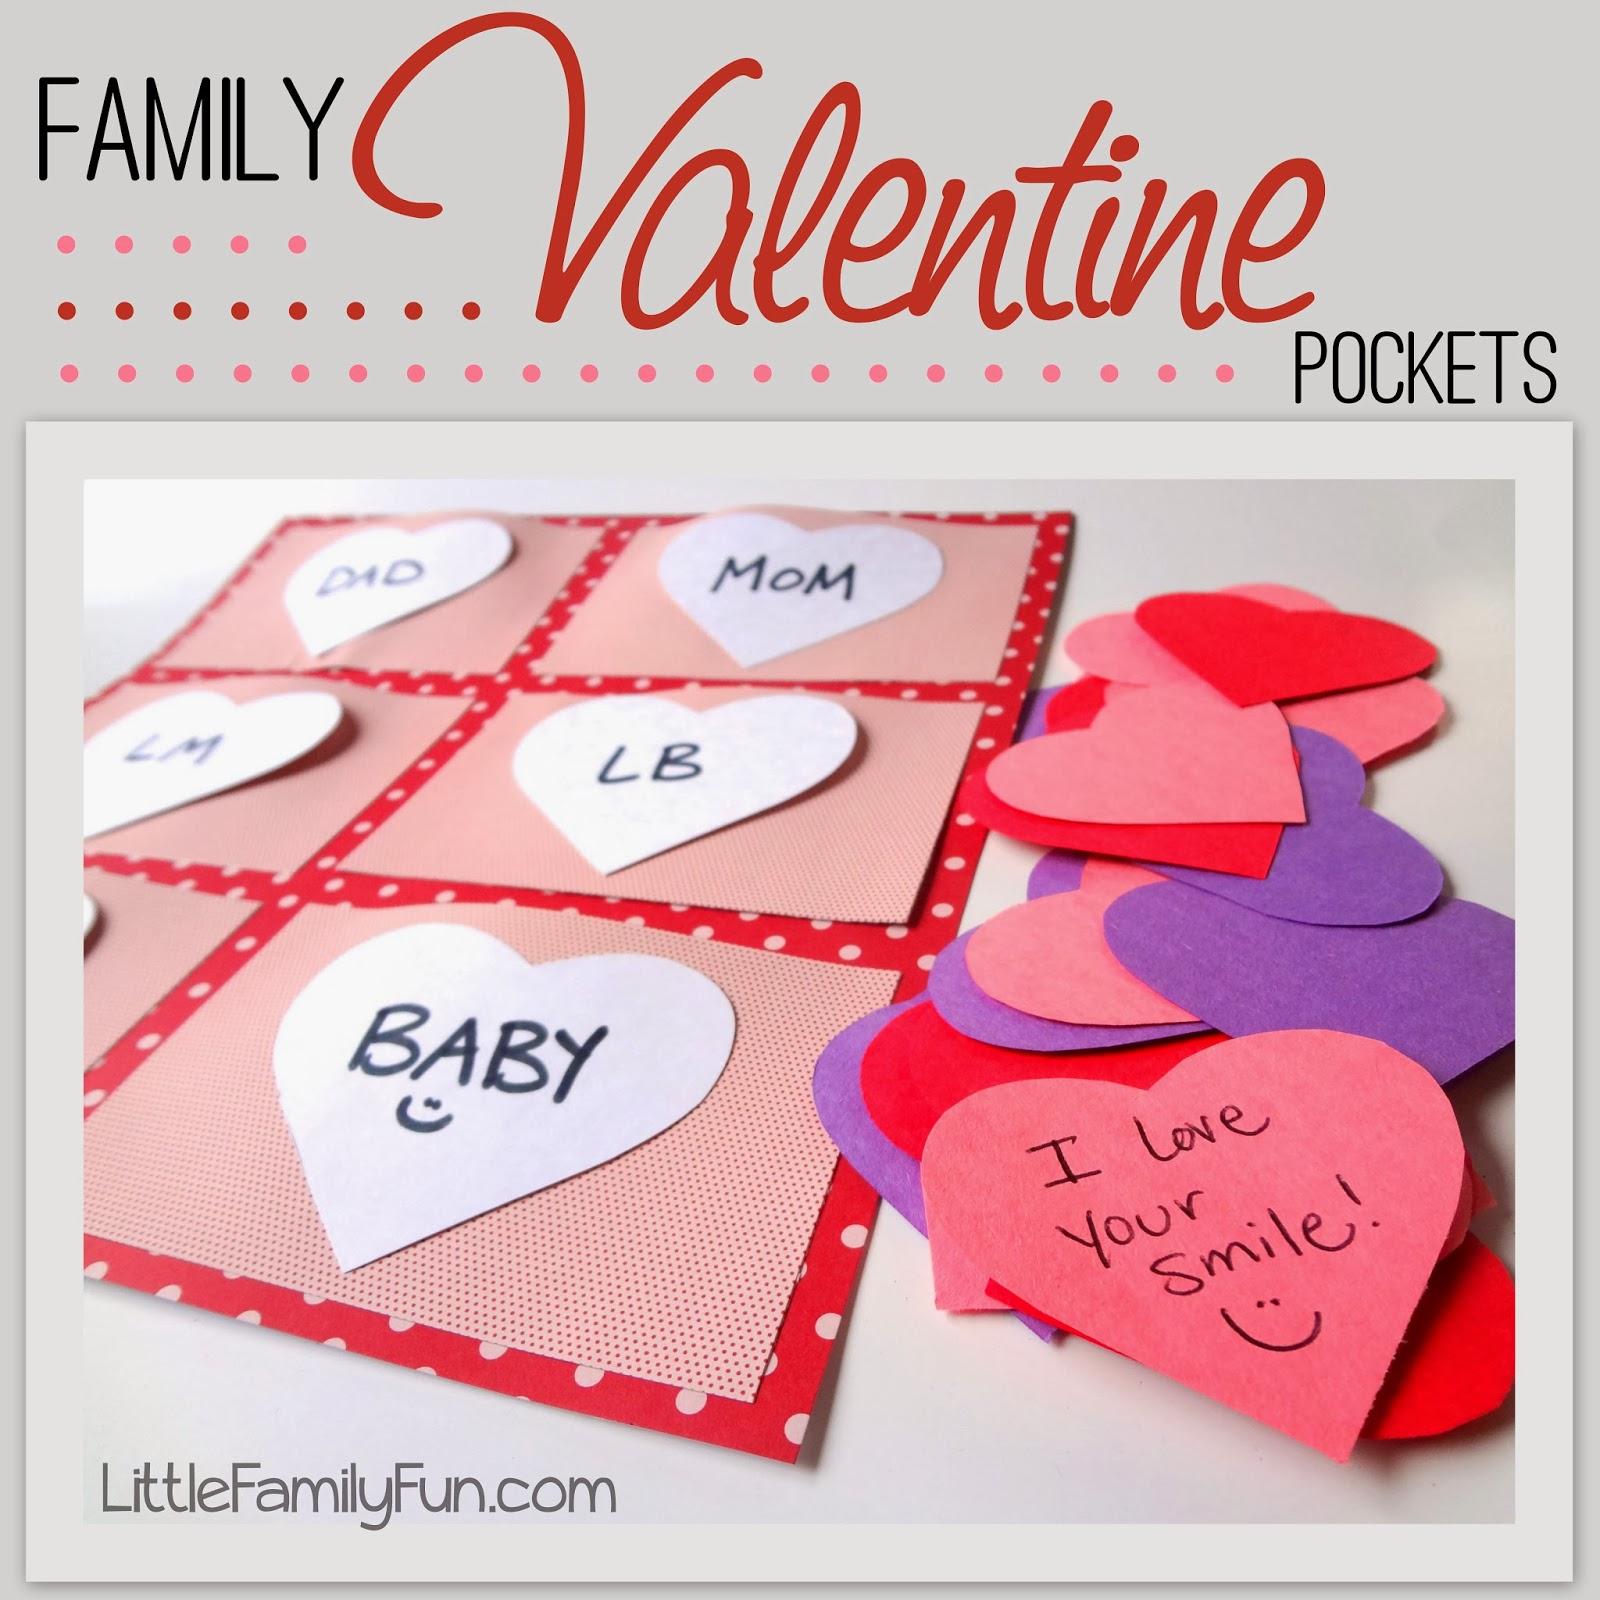 http://www.littlefamilyfun.com/2014/02/family-valentine-pockets.html